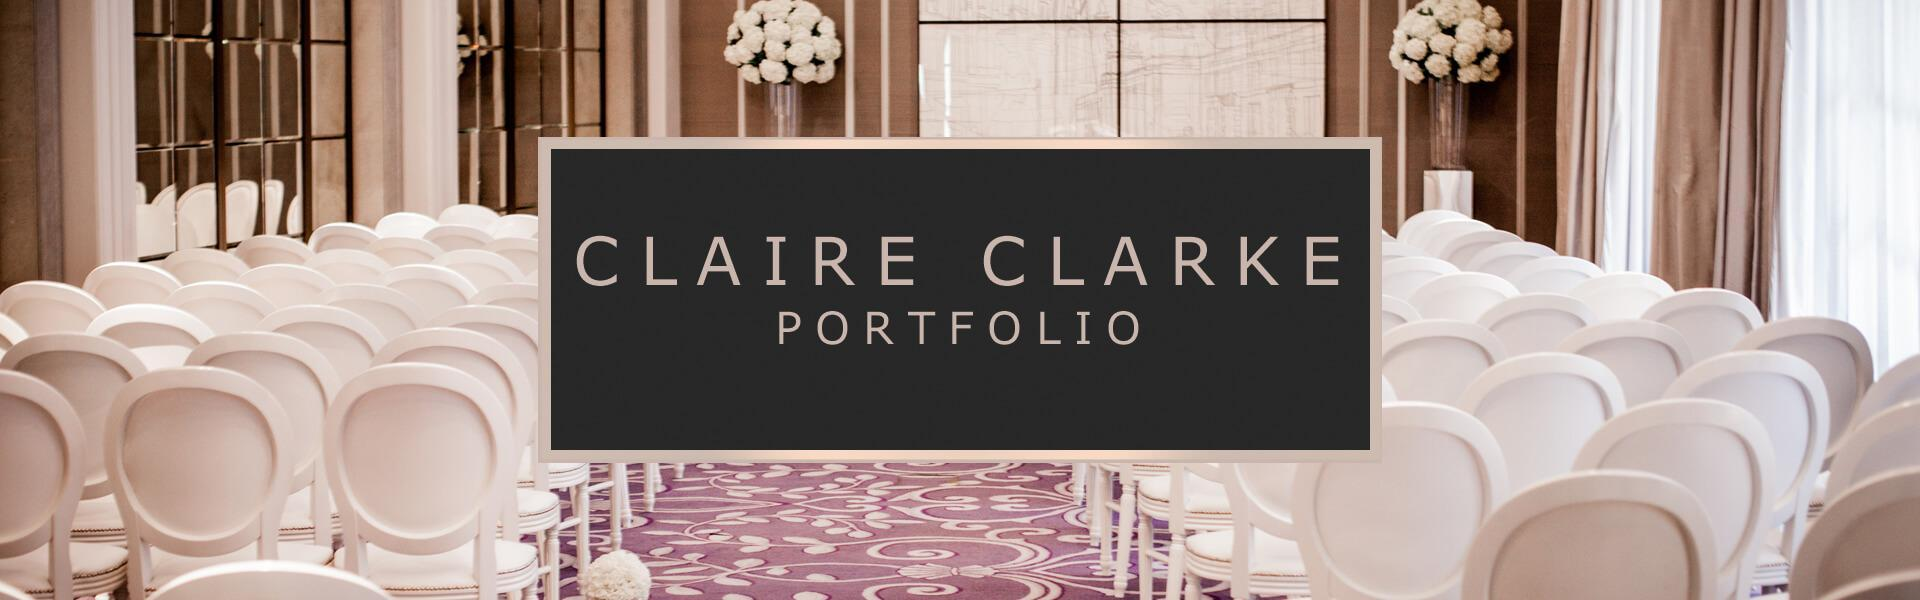 CLAIRE CLARKE PORTFOLIO